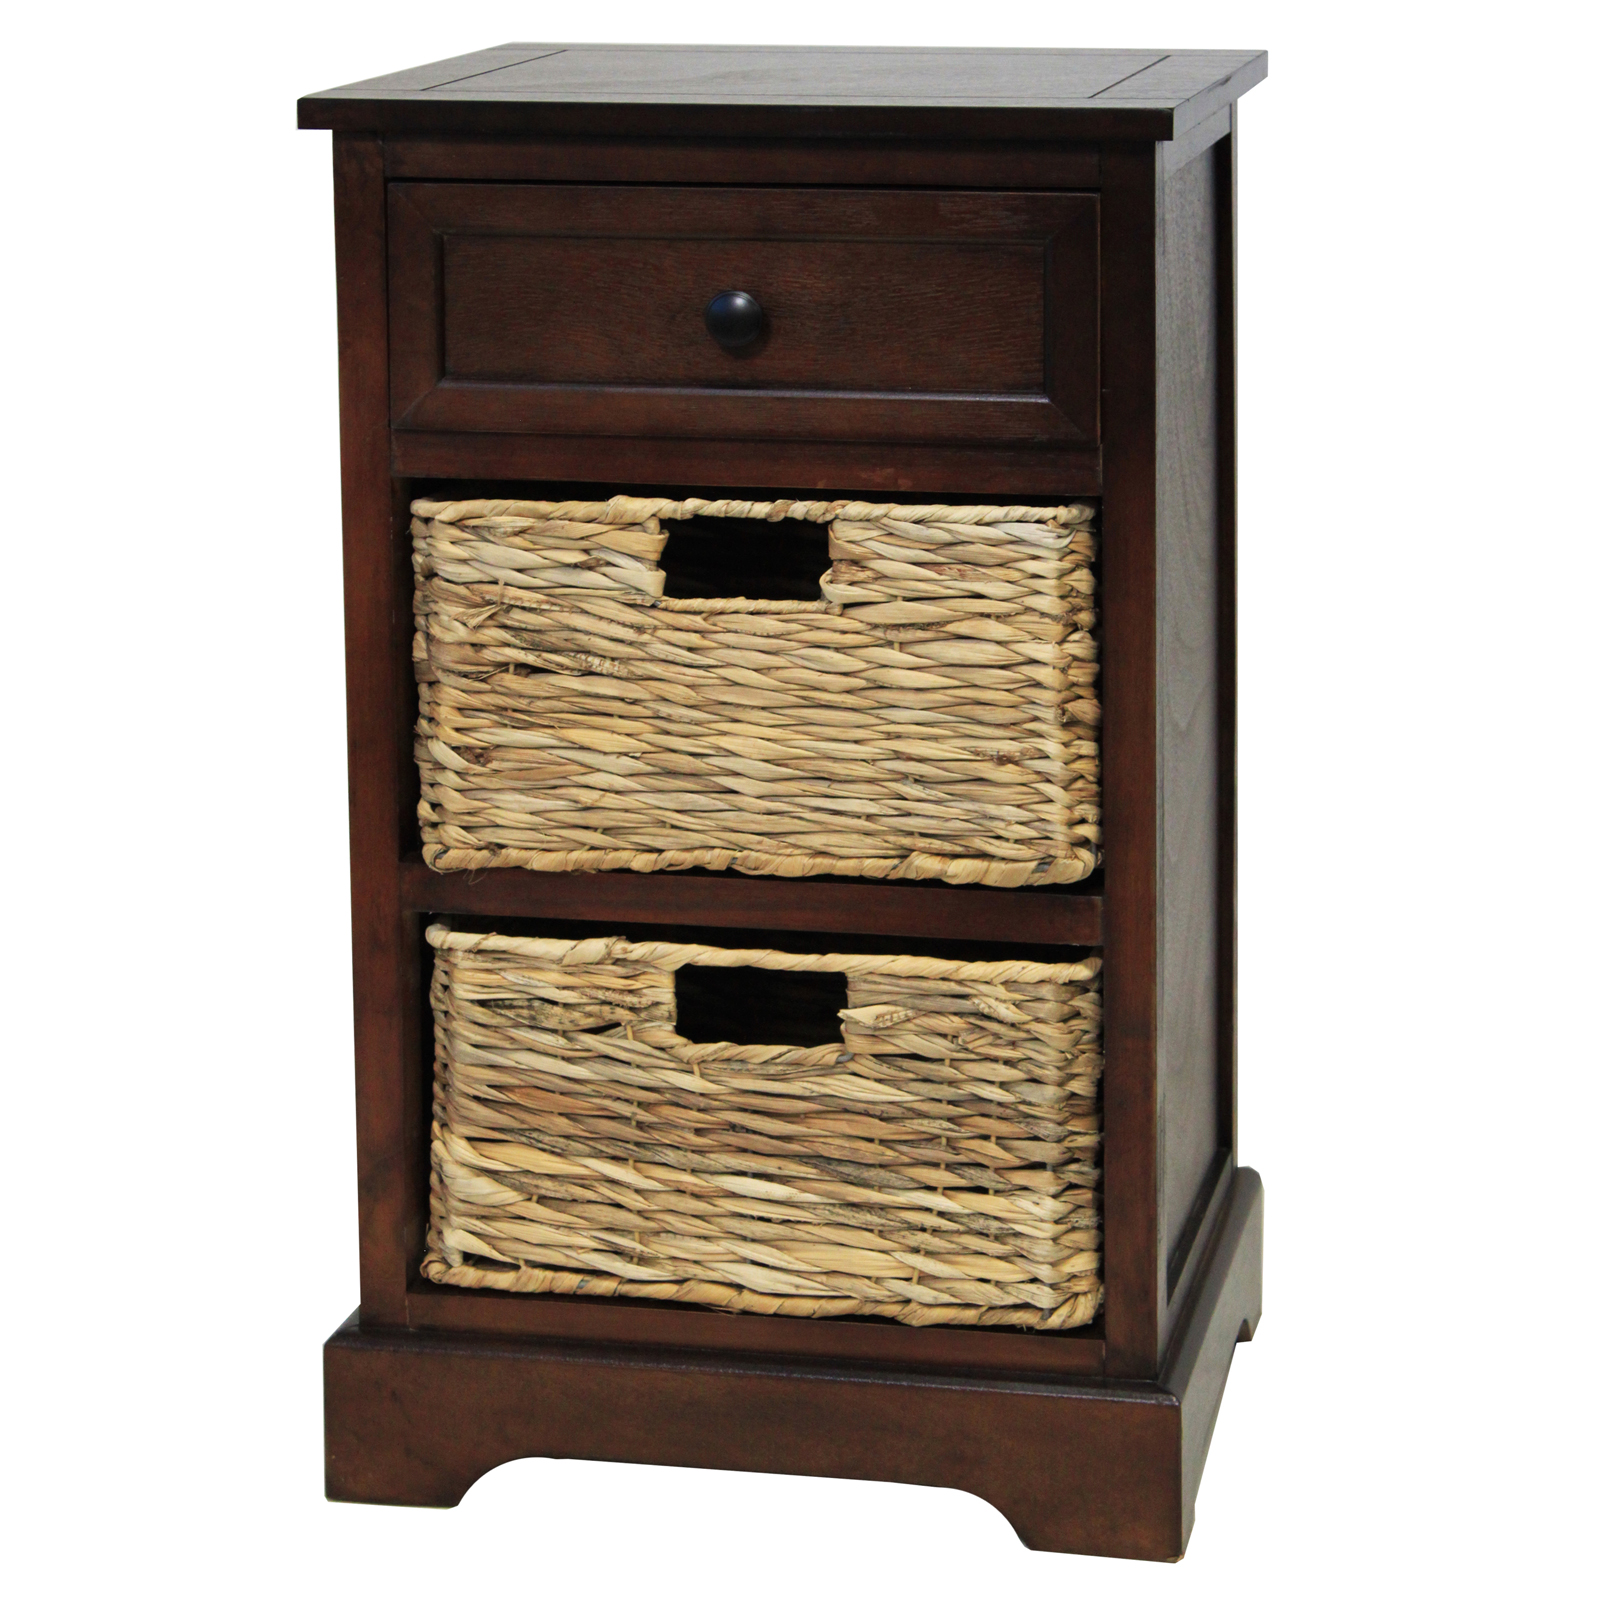 urban designs malibu 3 drawer night stand with wicker. Black Bedroom Furniture Sets. Home Design Ideas